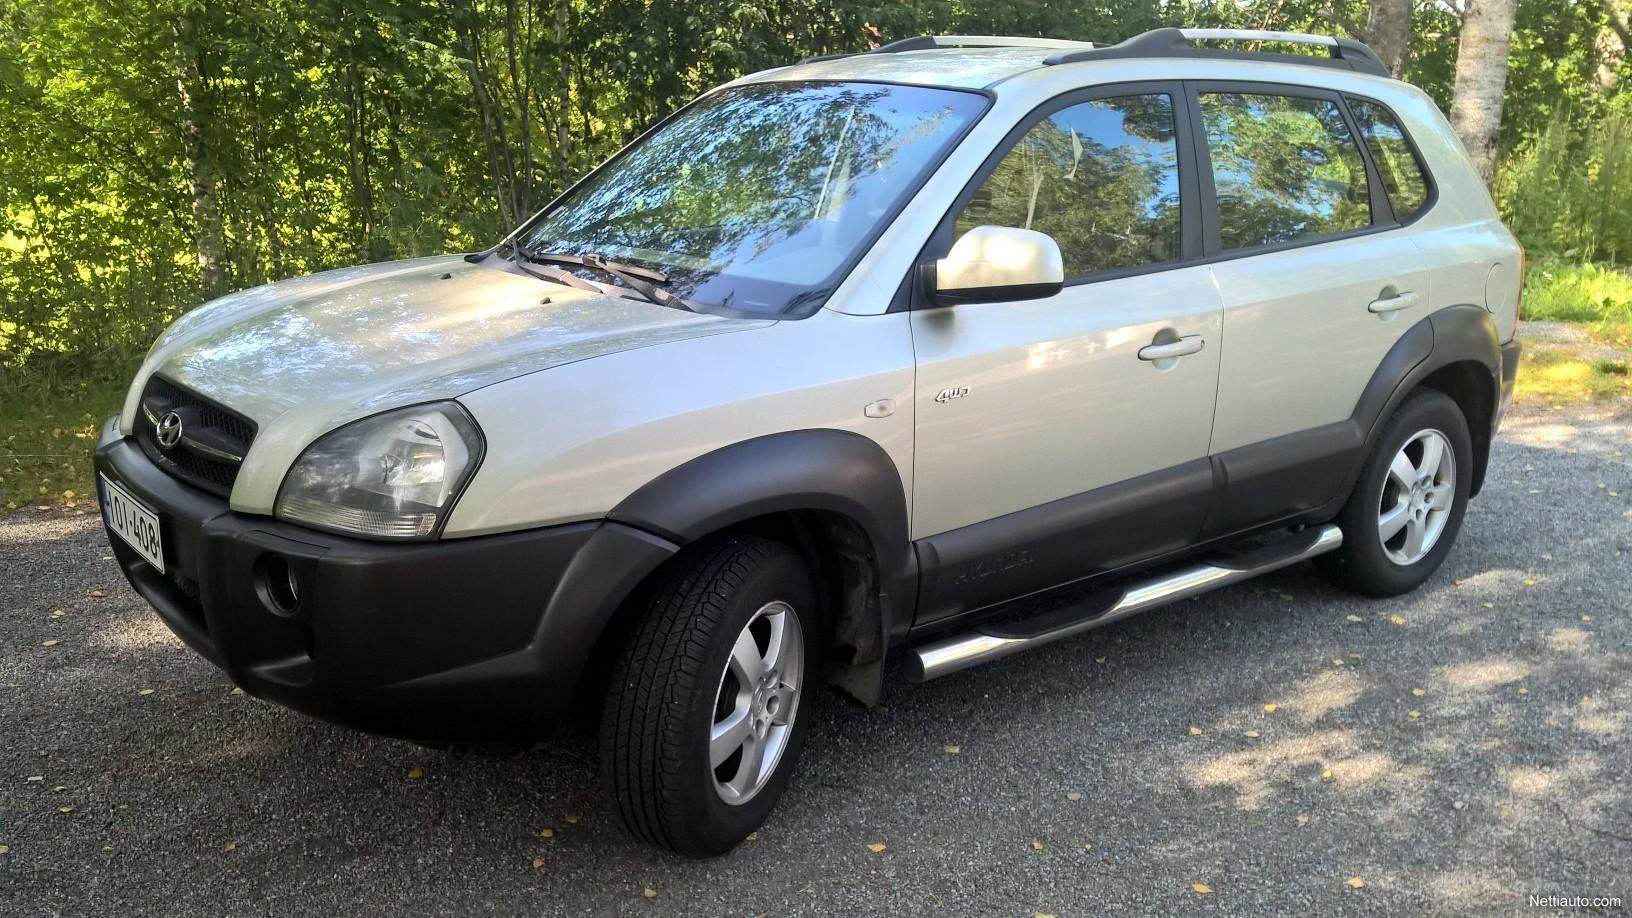 Are Kia And Hyundai The Same Company >> Hyundai Tucson 2 7 V6 Gls Aac Esp A